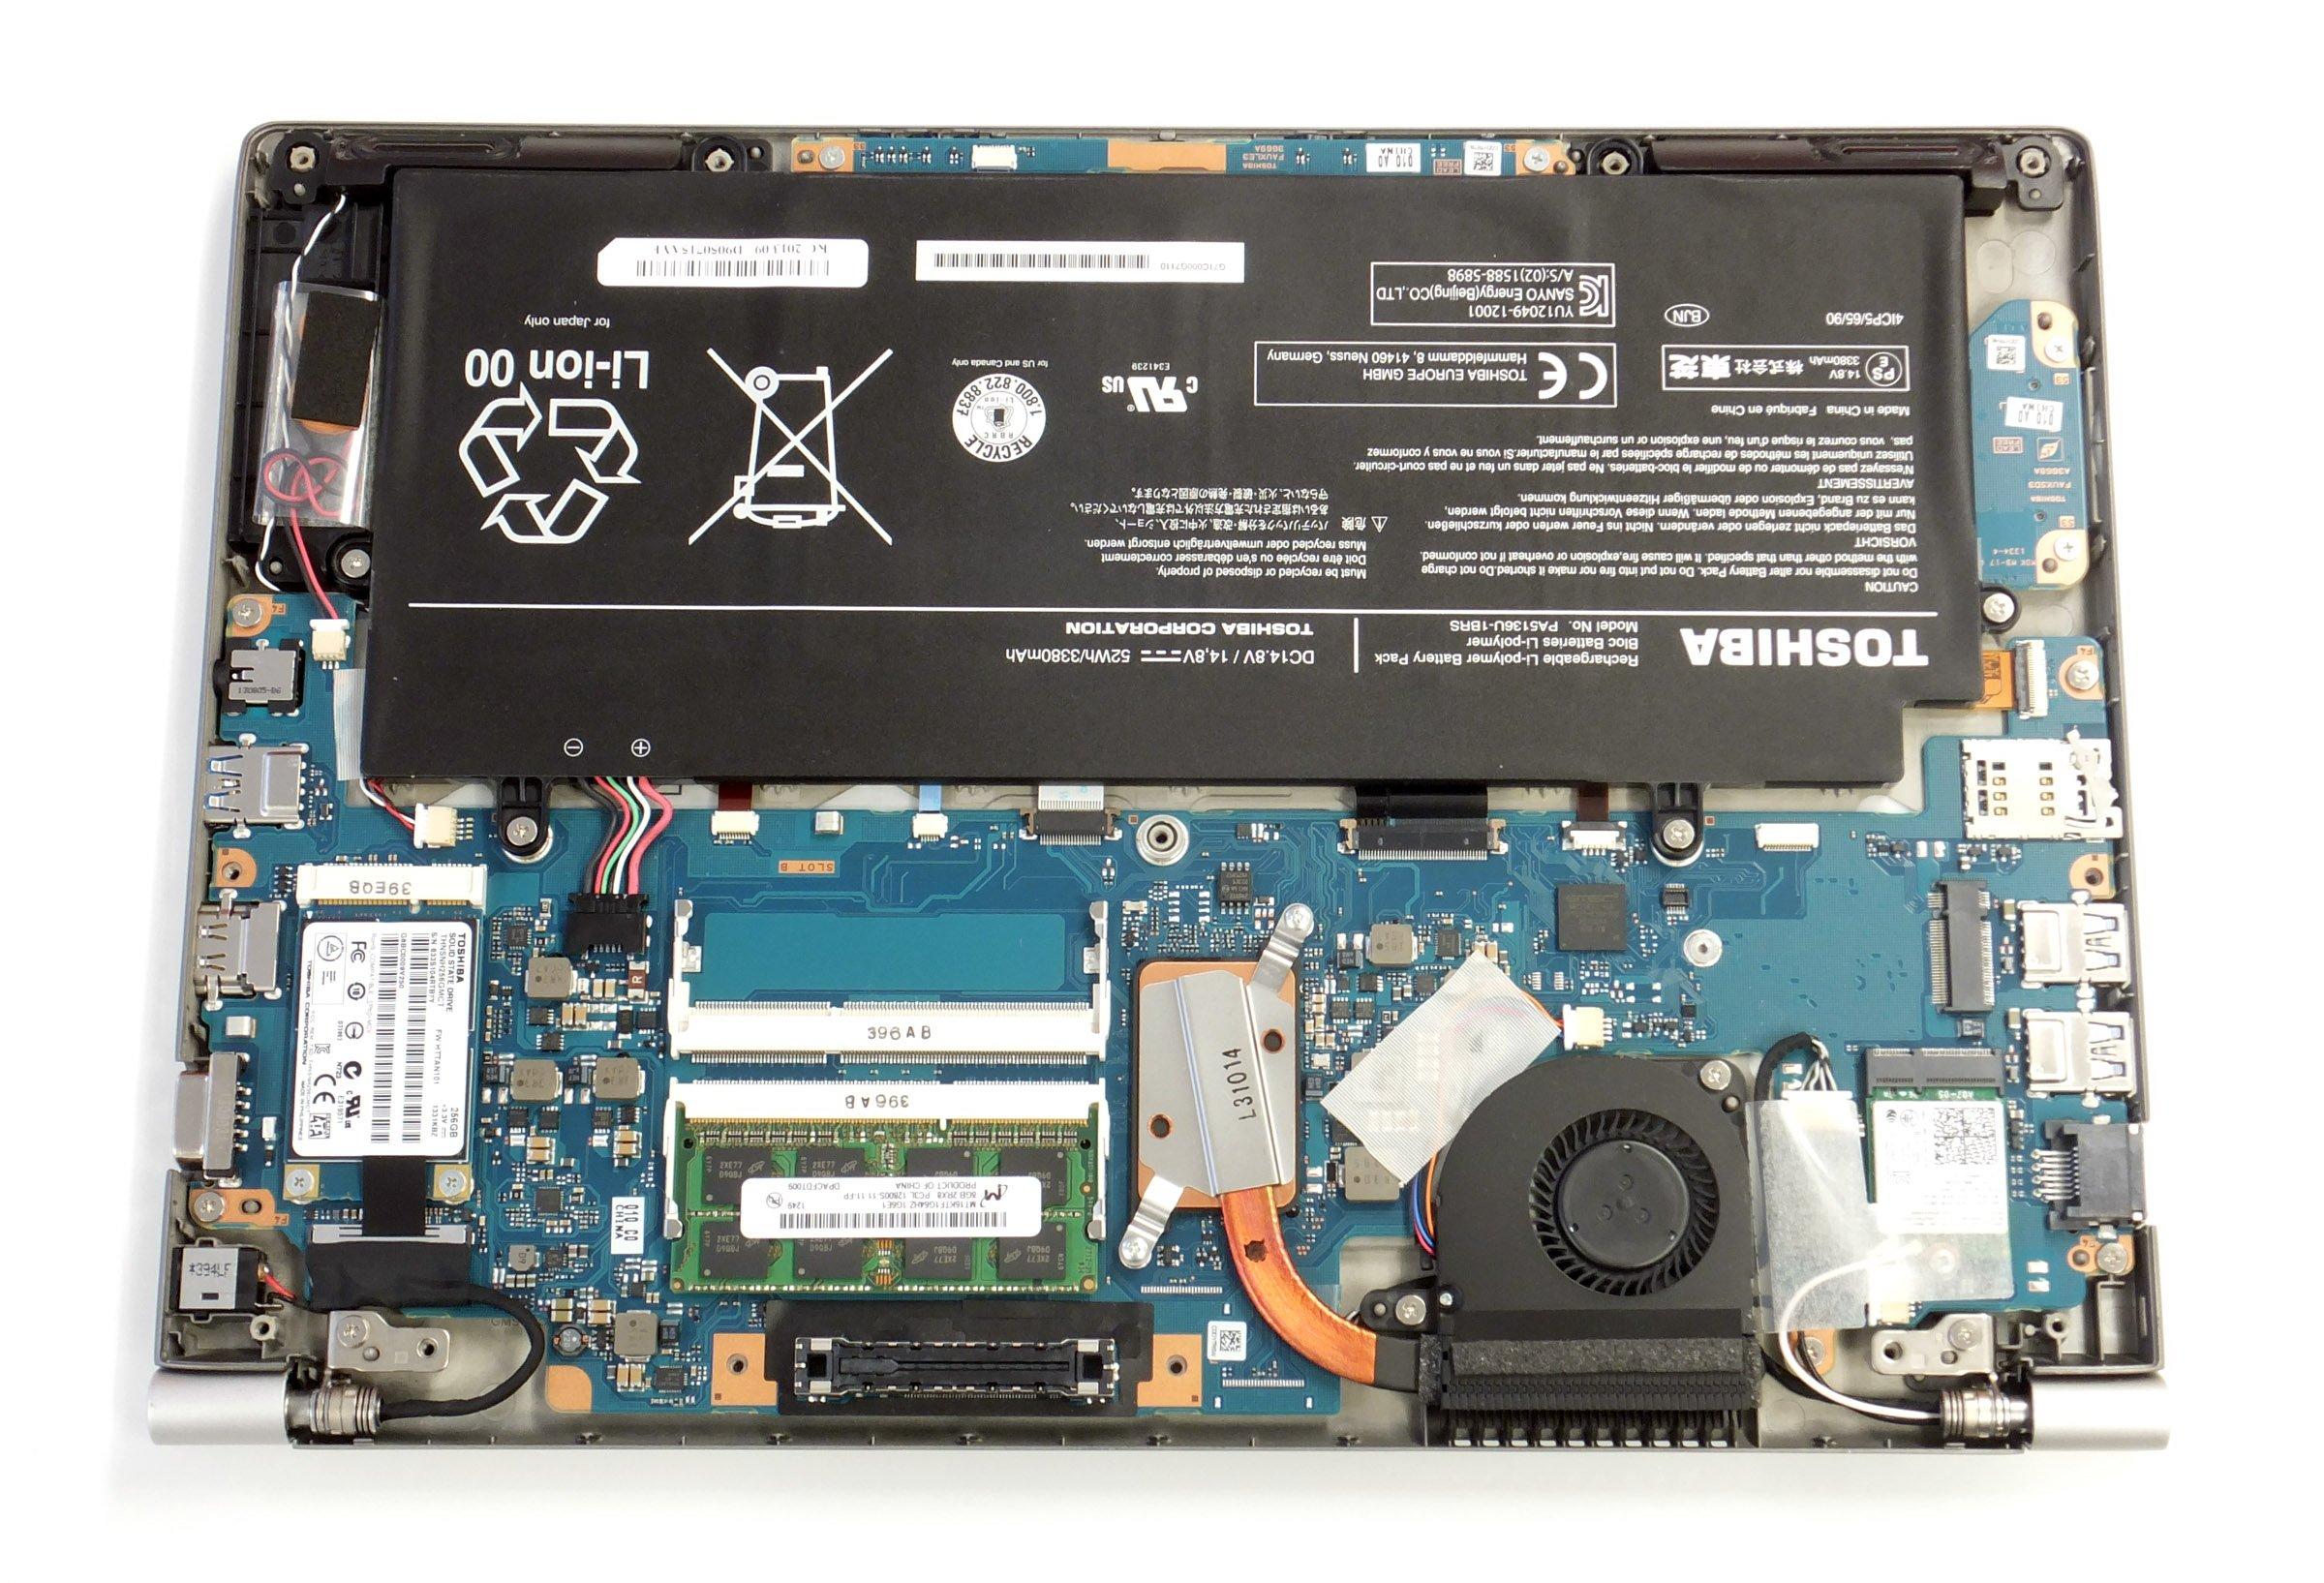 Light Fast And Pricey Toshibas Portege Z30 Now